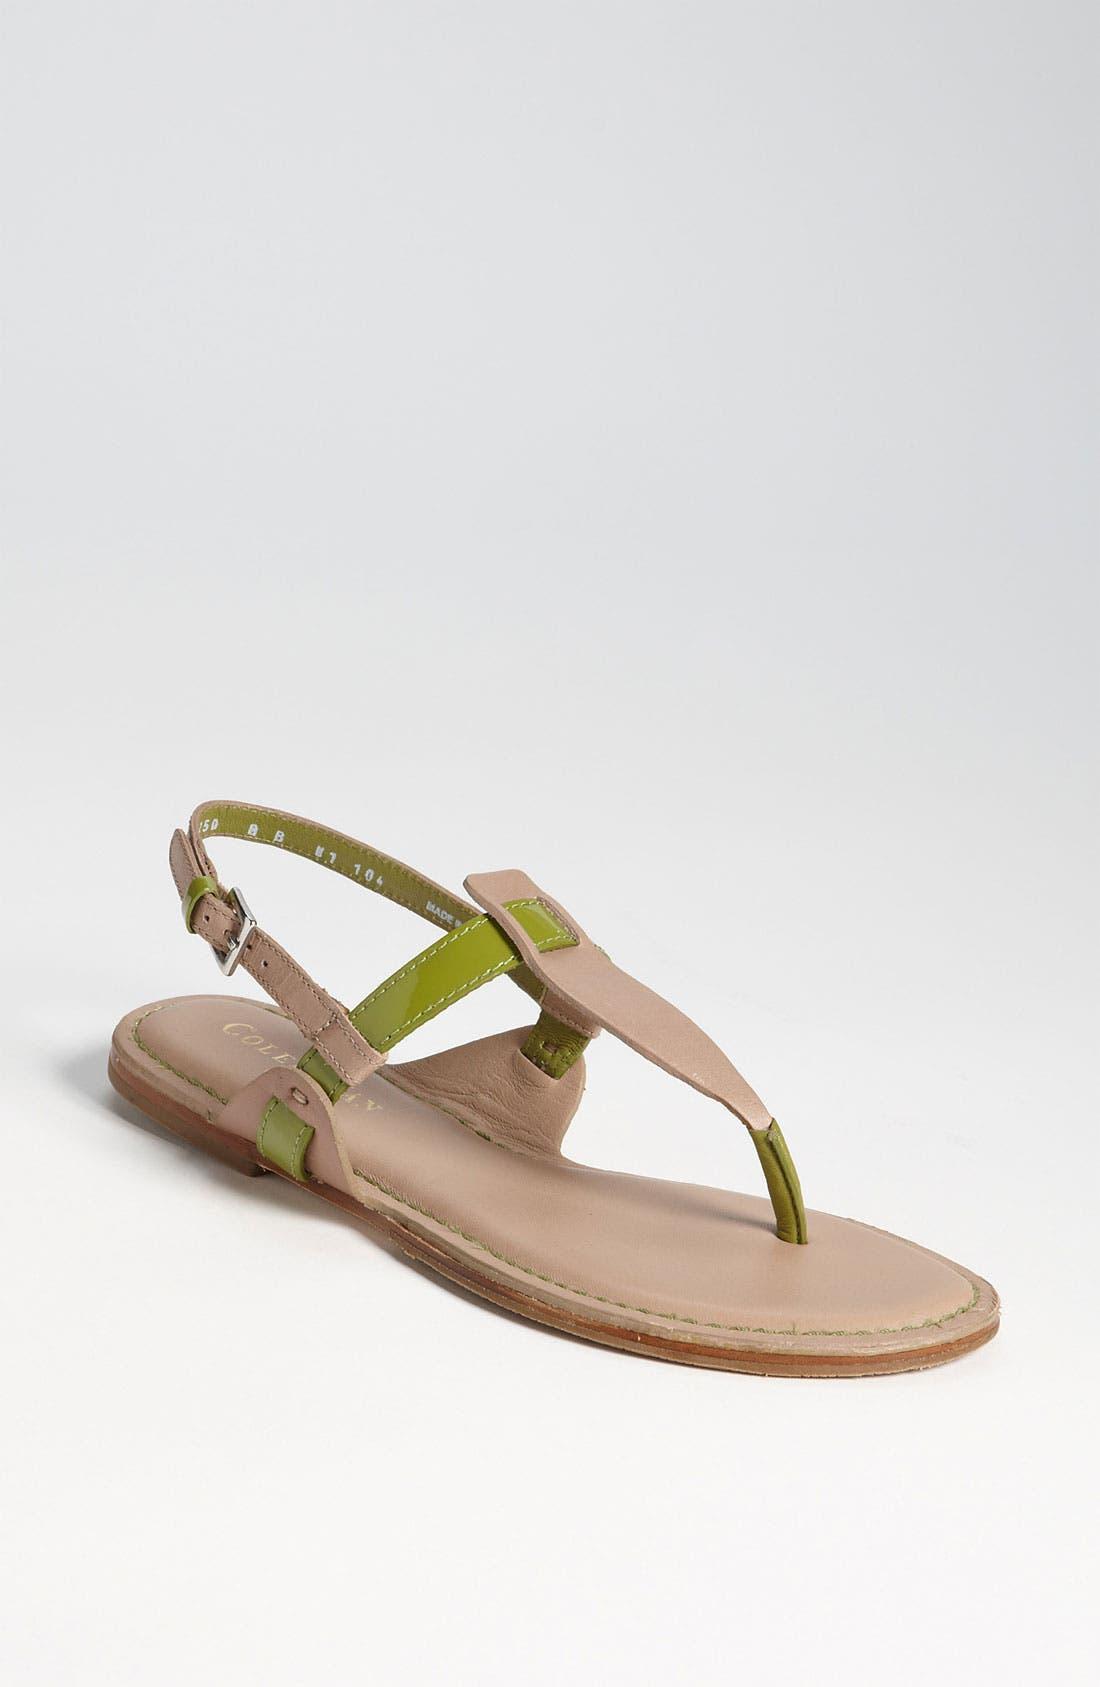 Main Image - Cole Haan 'Air Bridget' Sandal